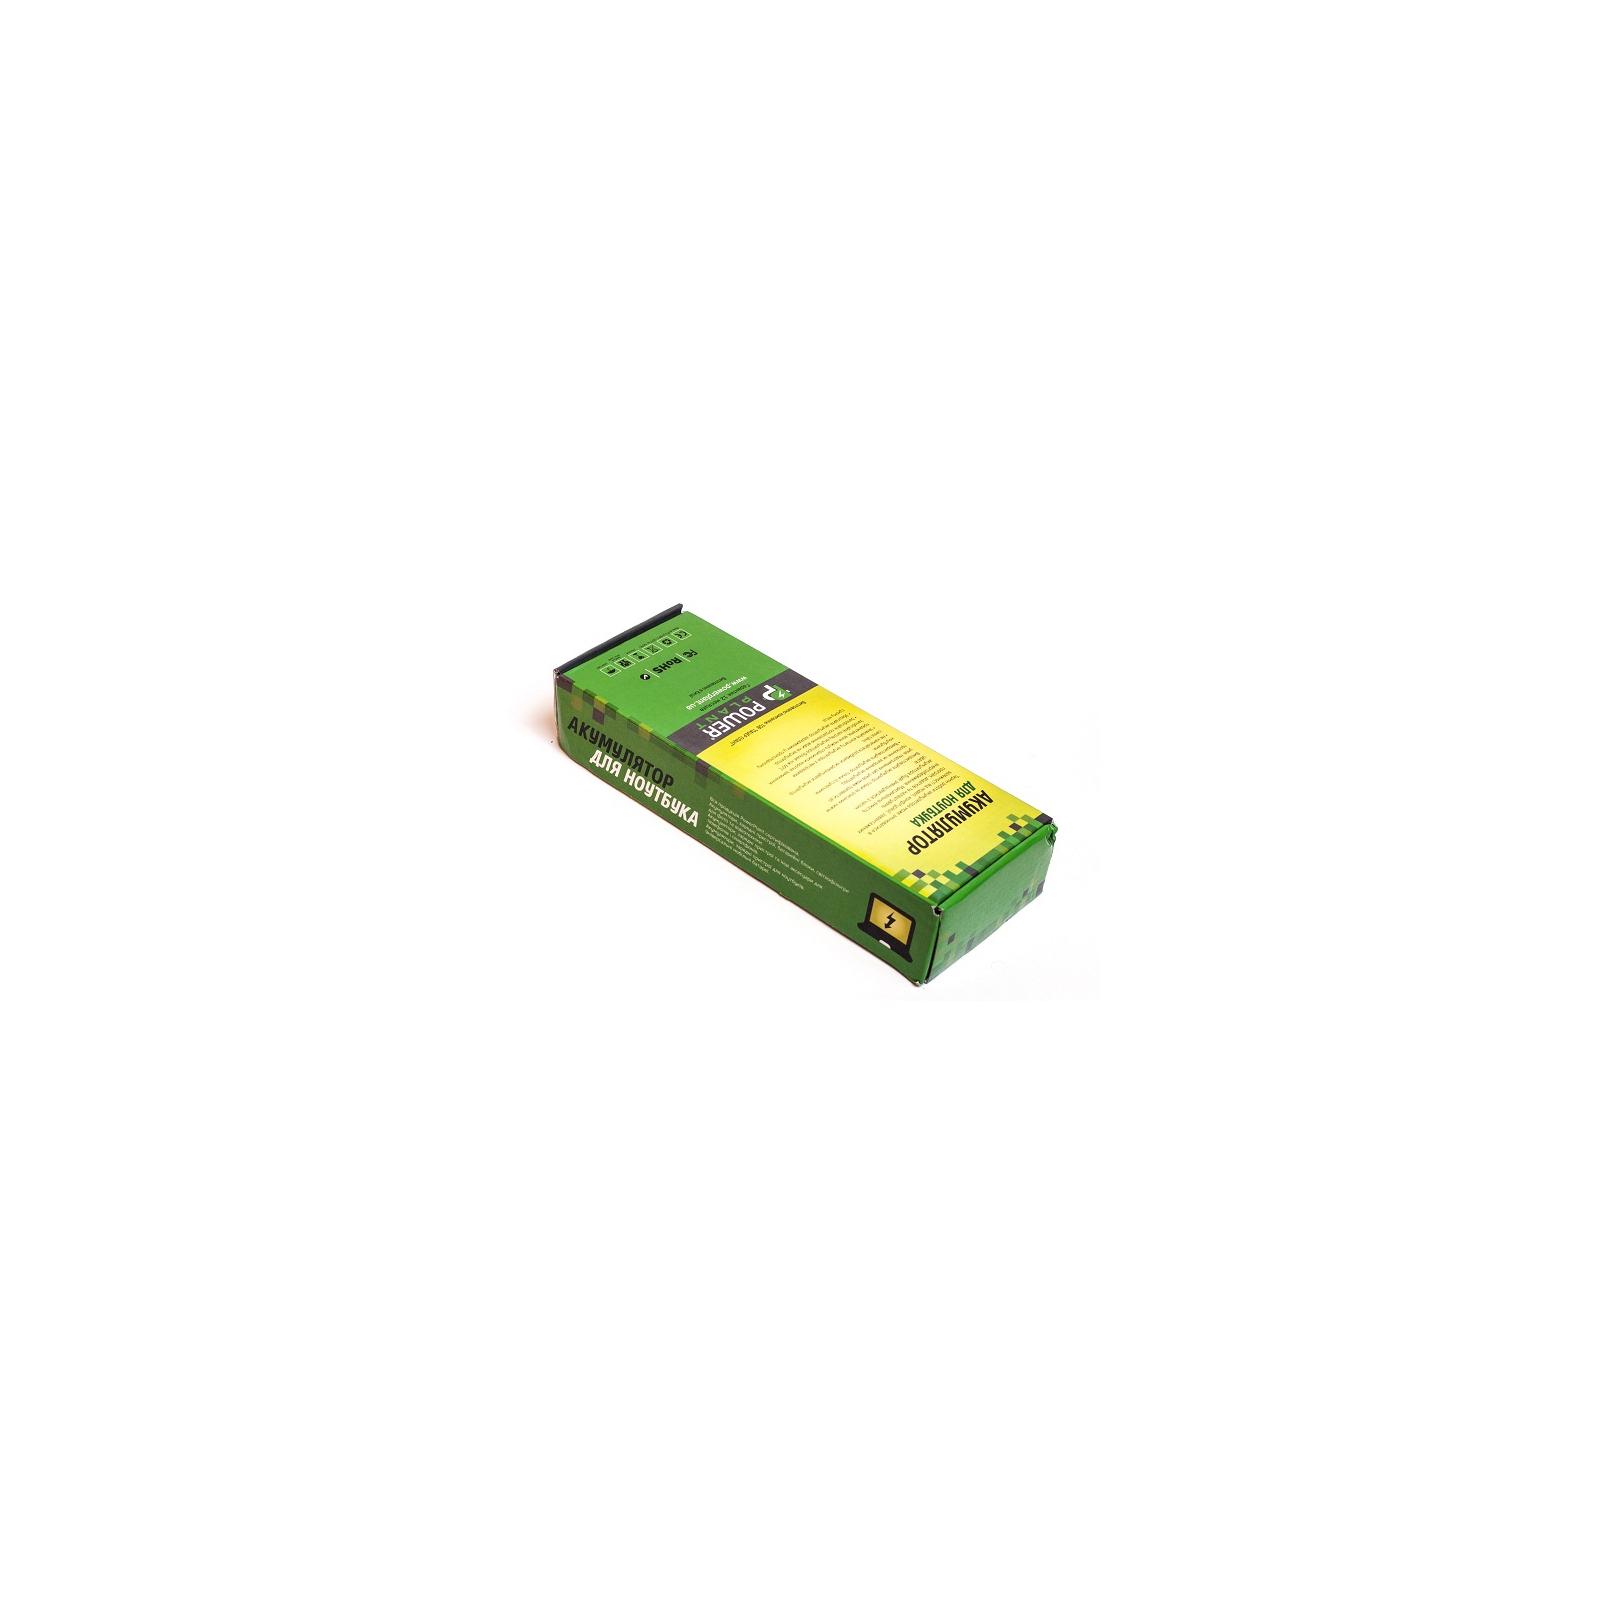 Аккумулятор для ноутбука DELL 1330 (PU556 DE-M1330-6) 11.1V 5200mAh PowerPlant (NB00000176) изображение 2